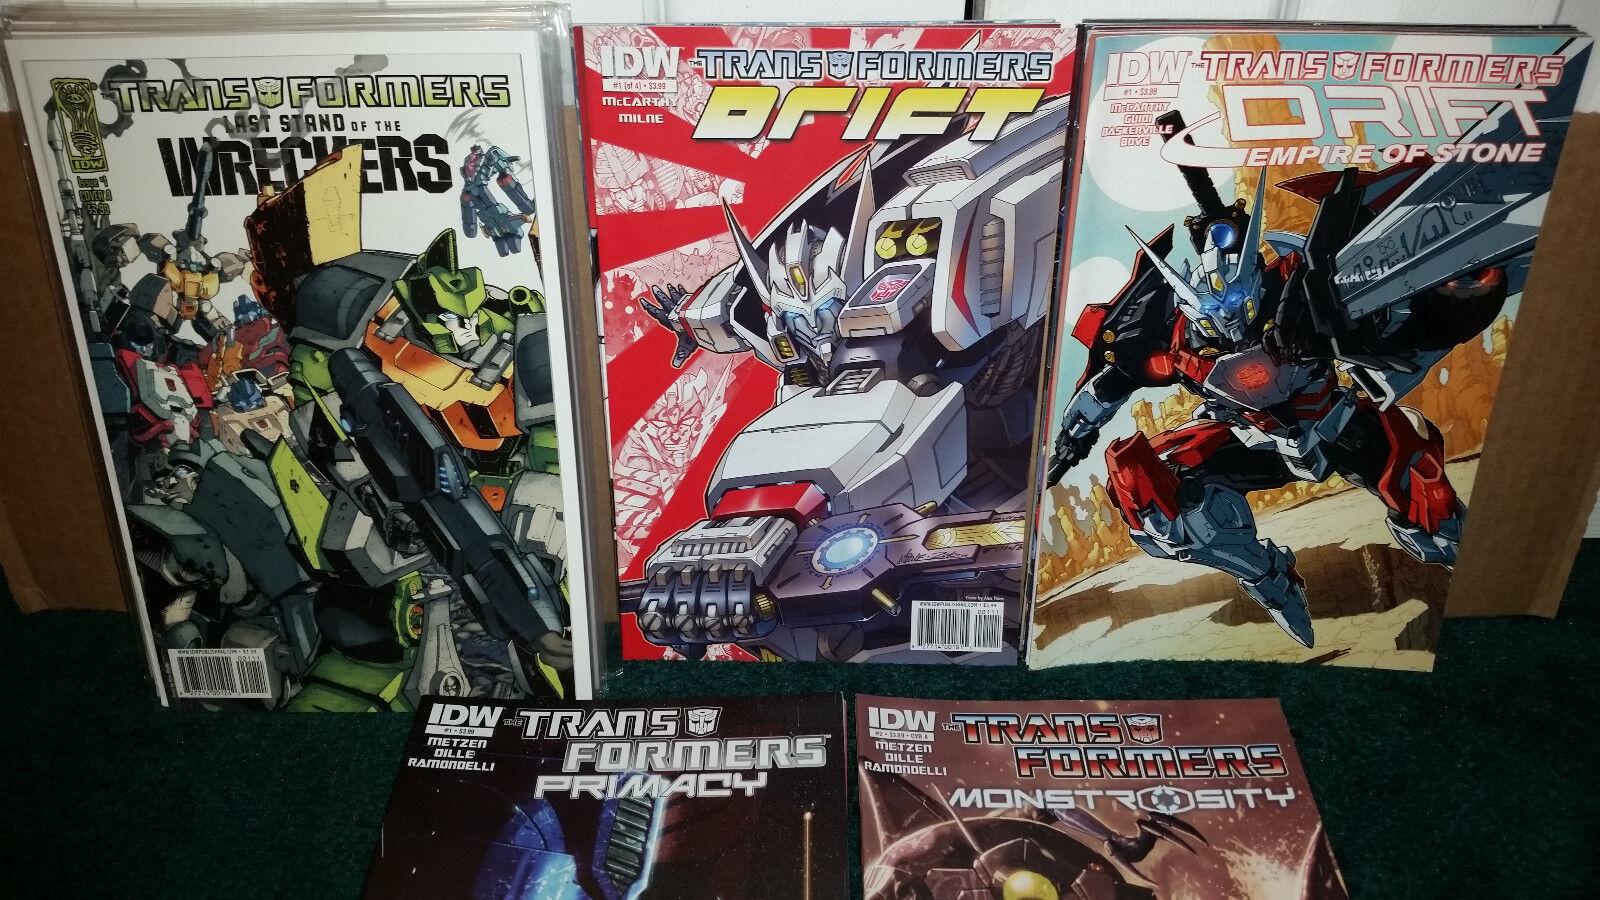 Idw Transformers los saboteadores   1-5 un b Drift   1-4 primacía   1-4 un b monstruosidad   2-4